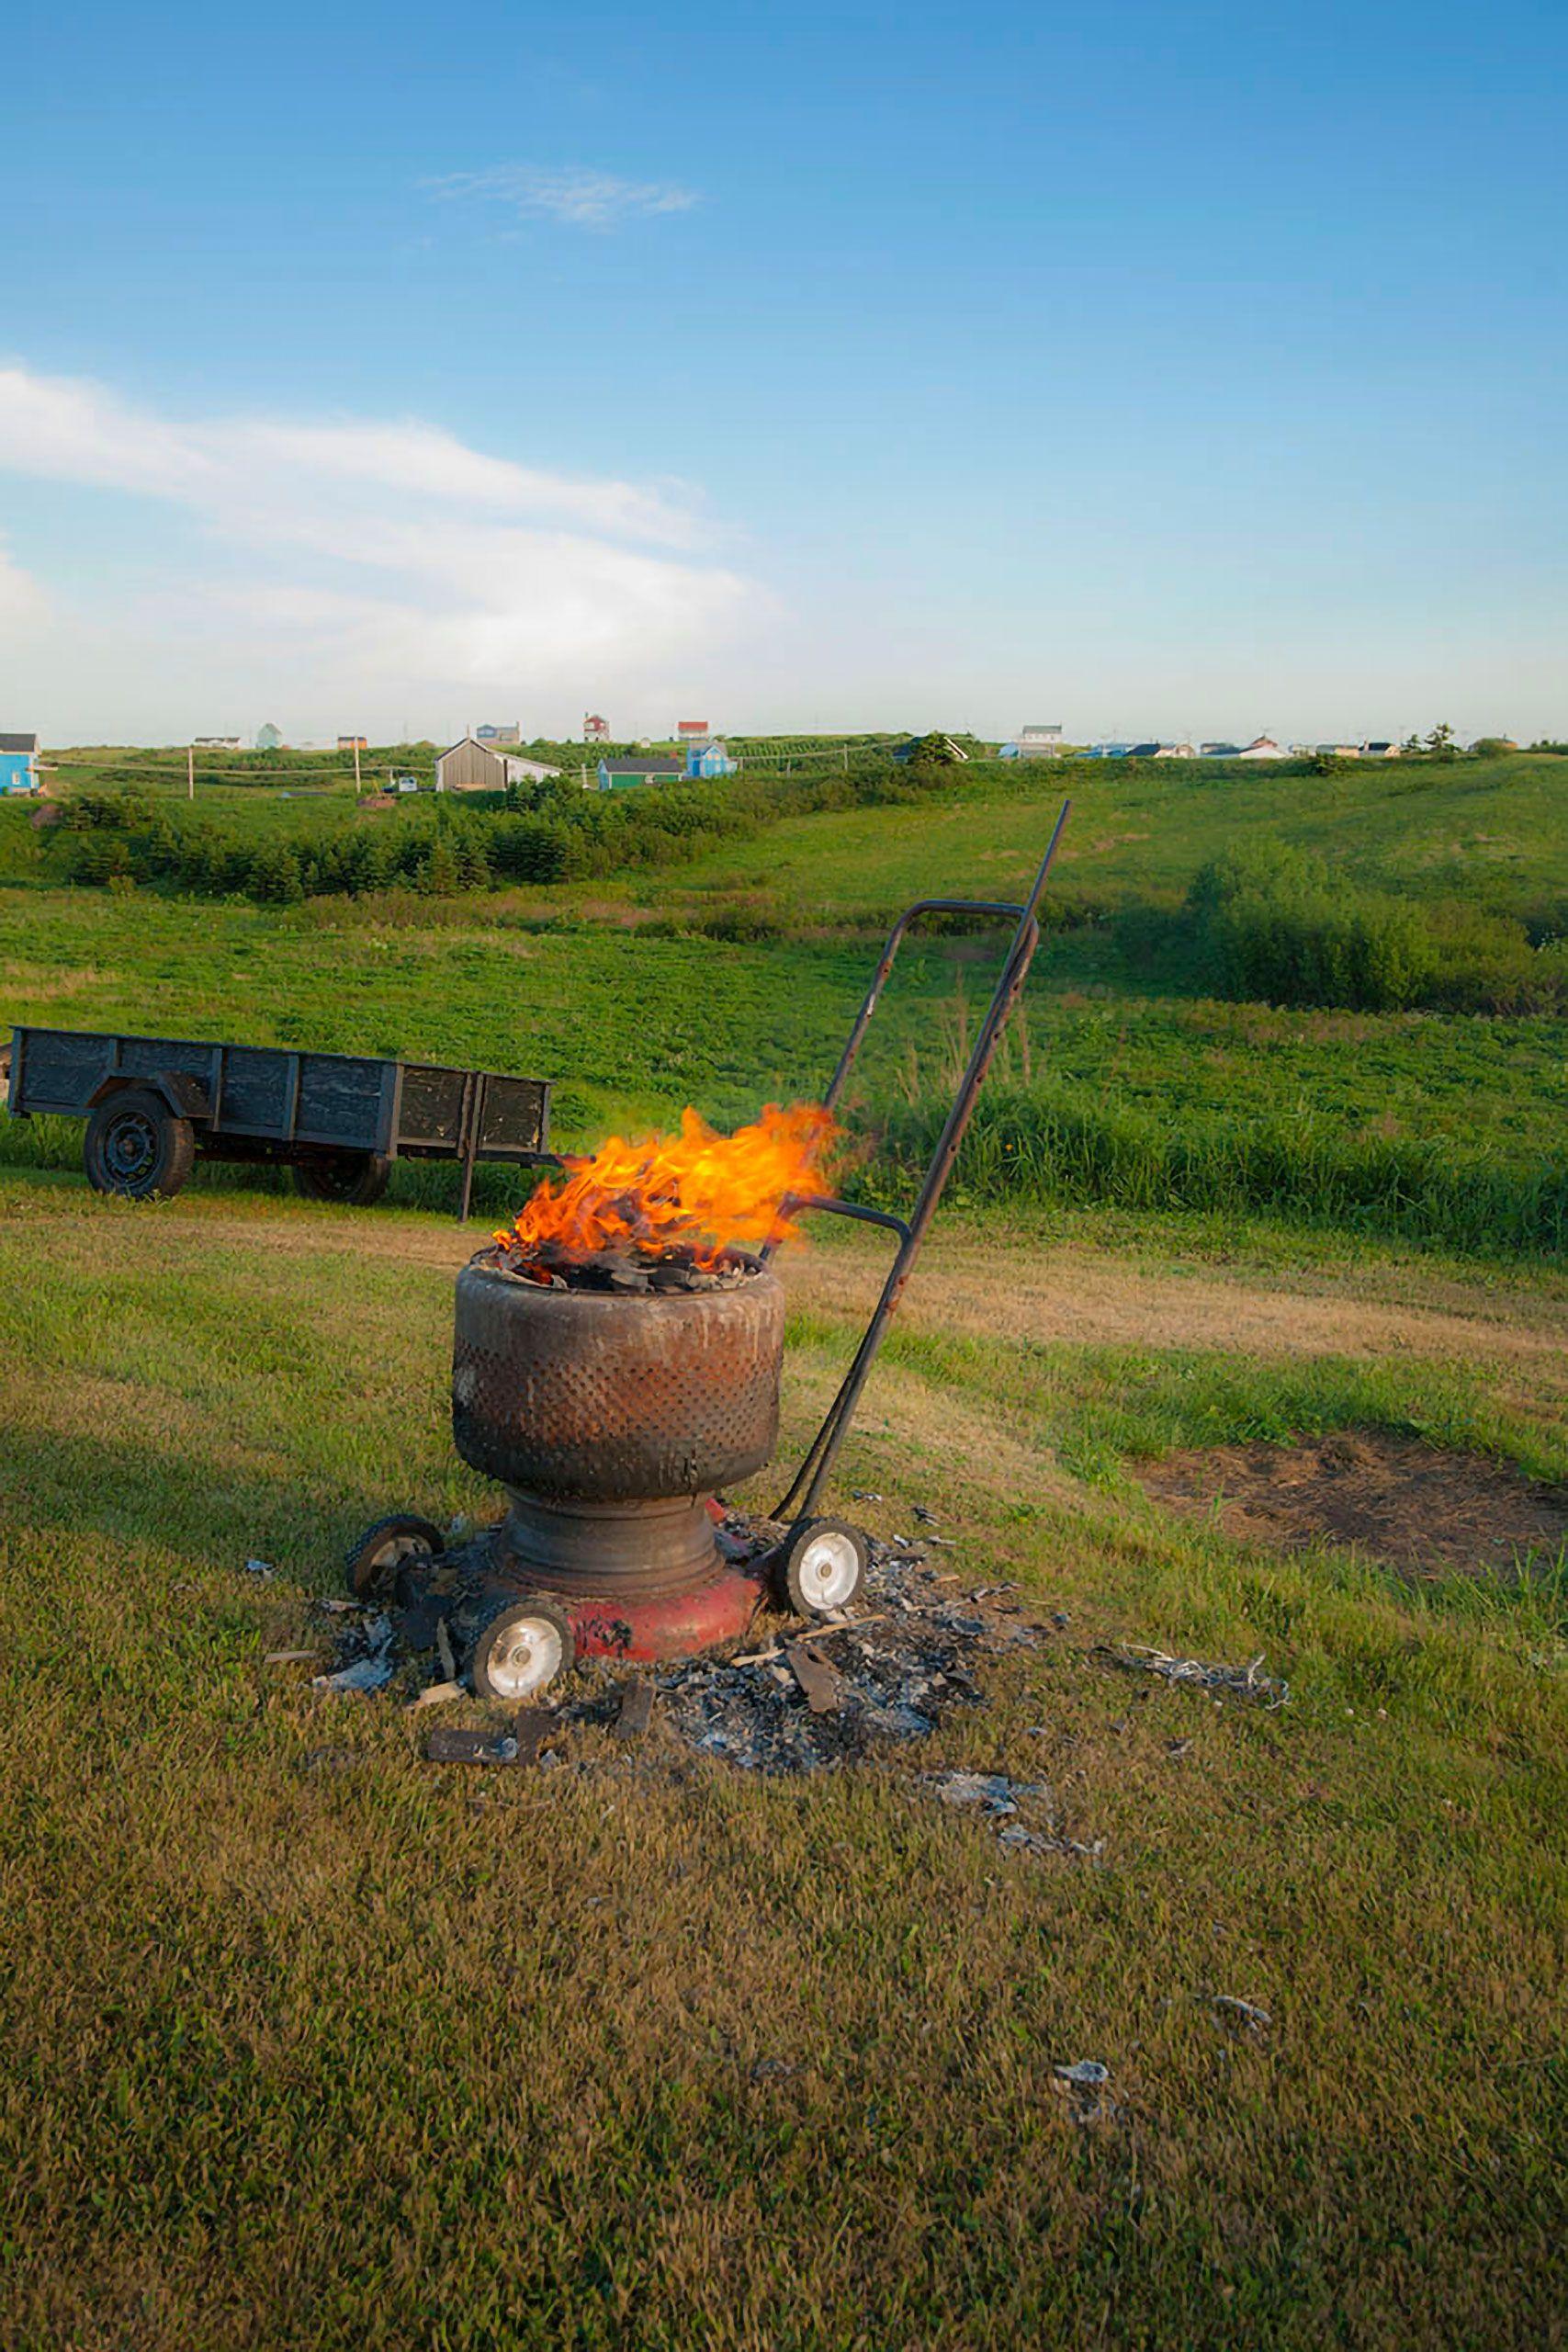 fire in a wash tub on a lawn mower Magdalen Islands Îles de la Madeleine Quebec Canada  Harve Aubert